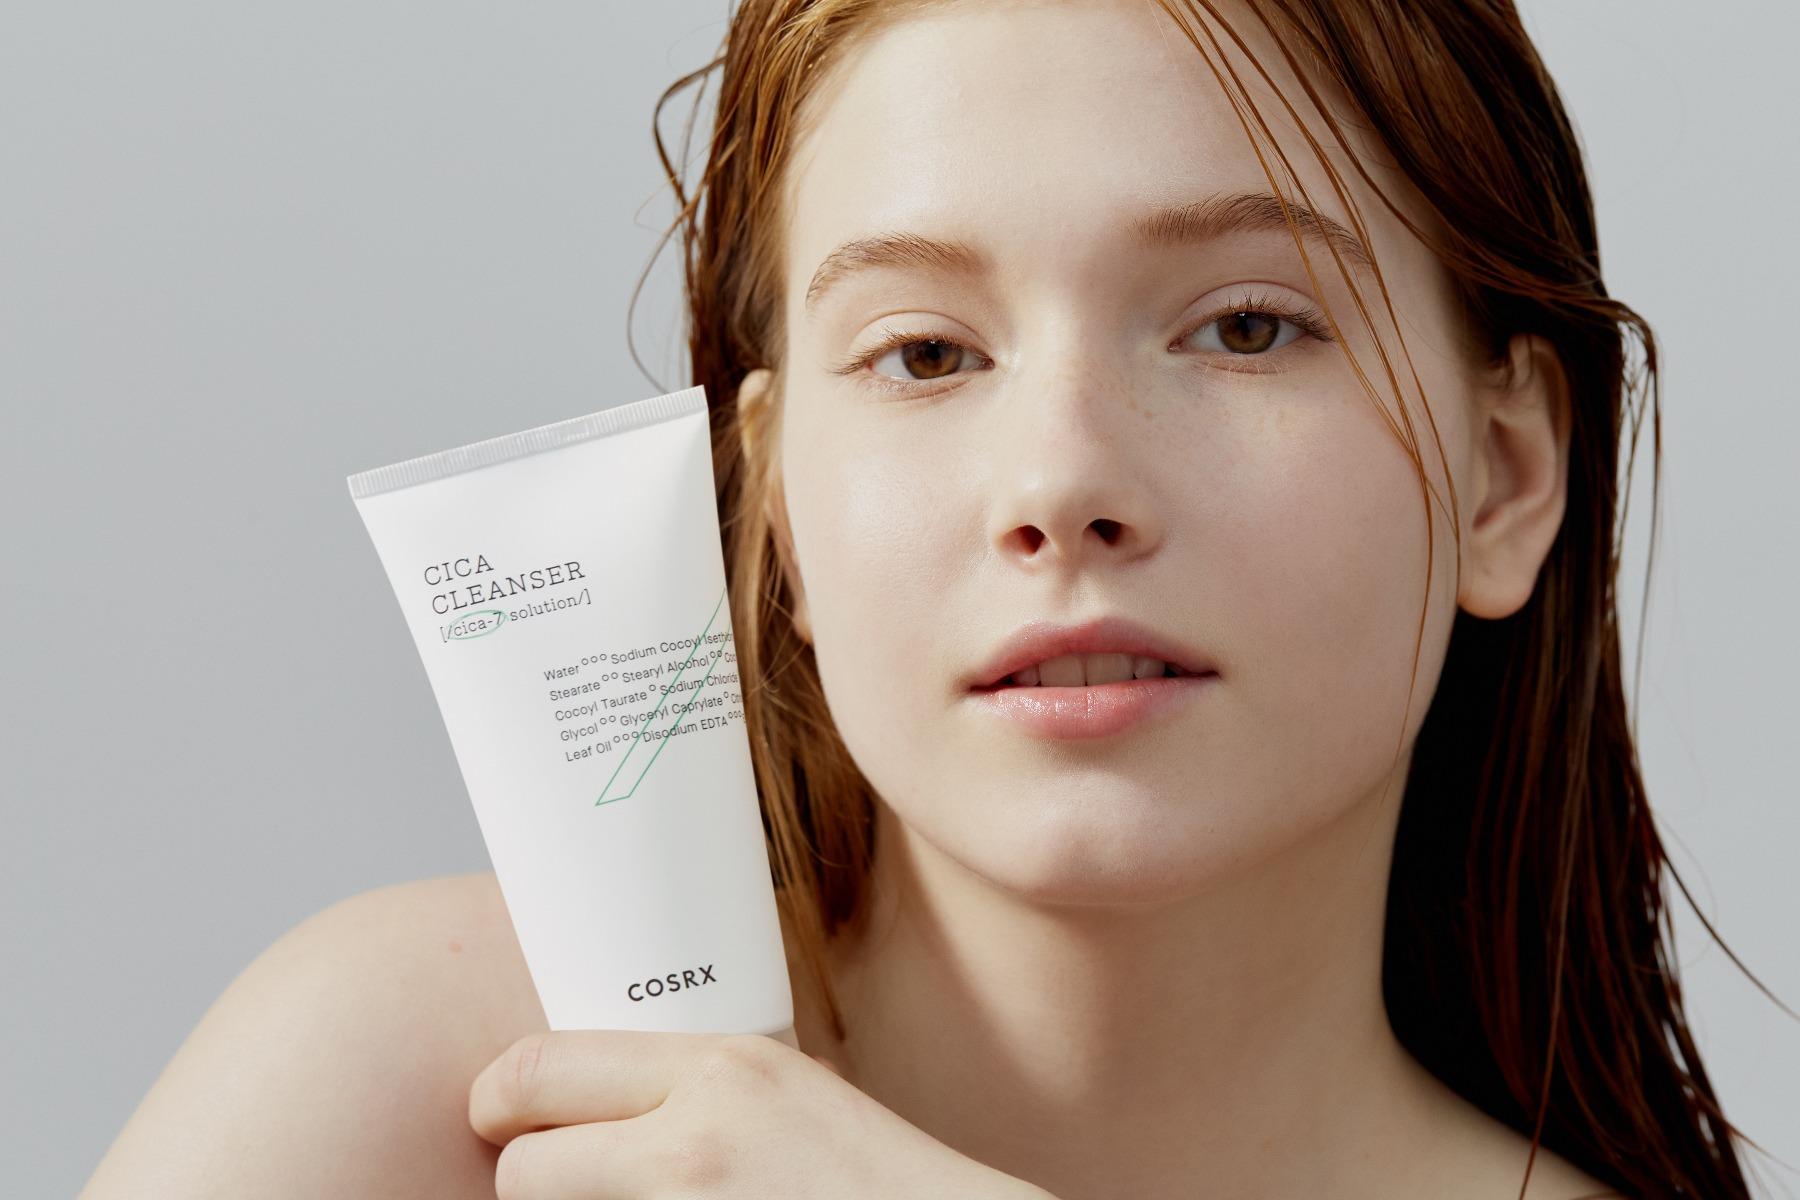 COSRX Pure Fit Cica Cleanser